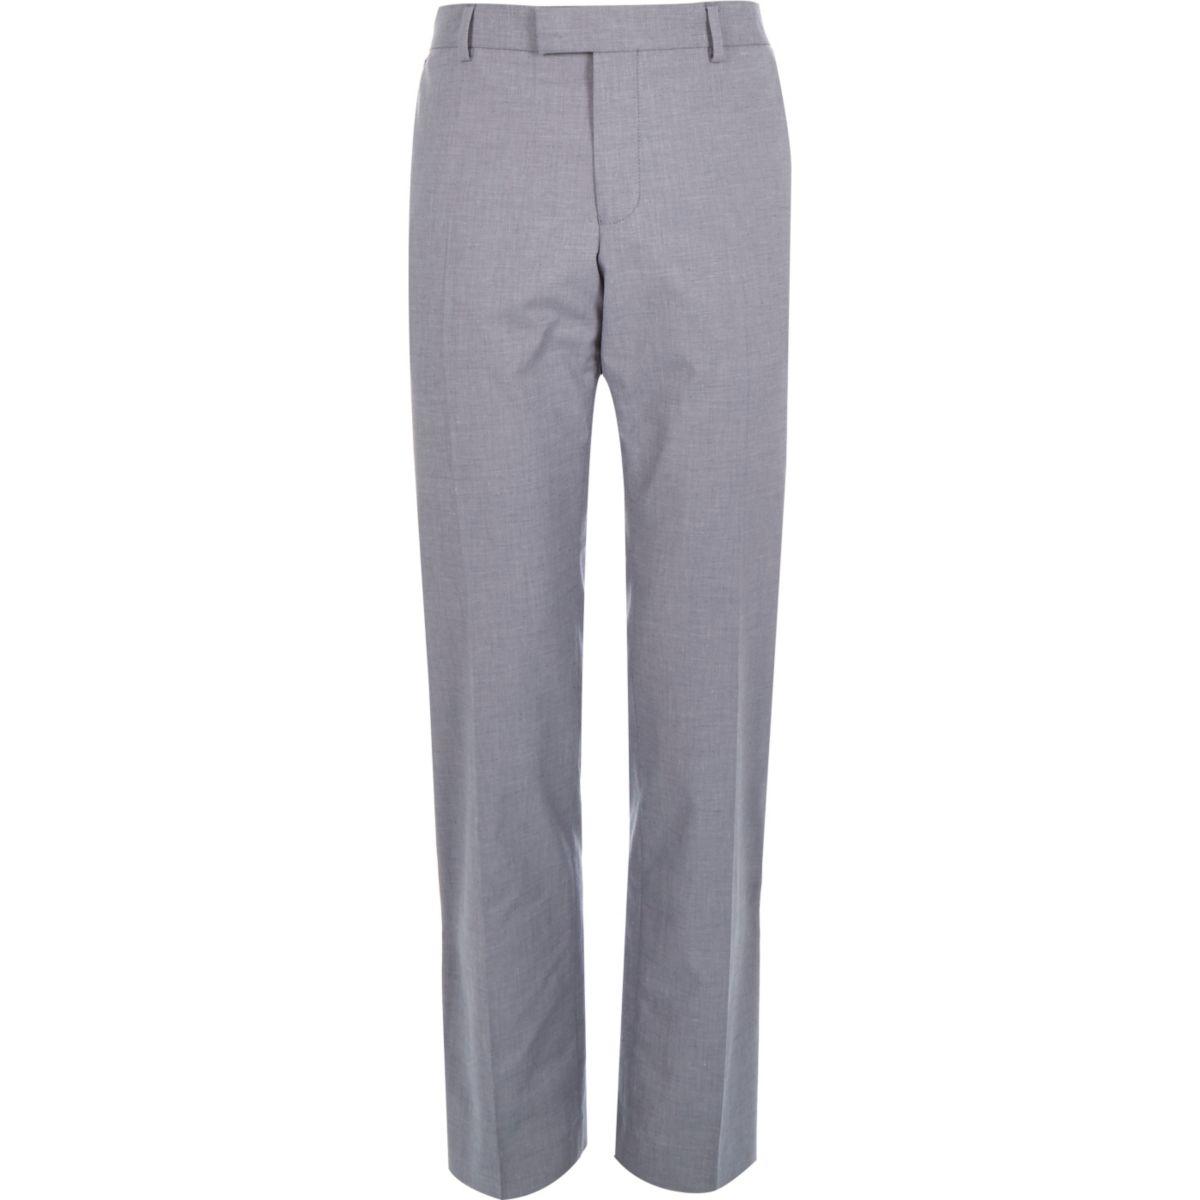 Blue chambray smart pants